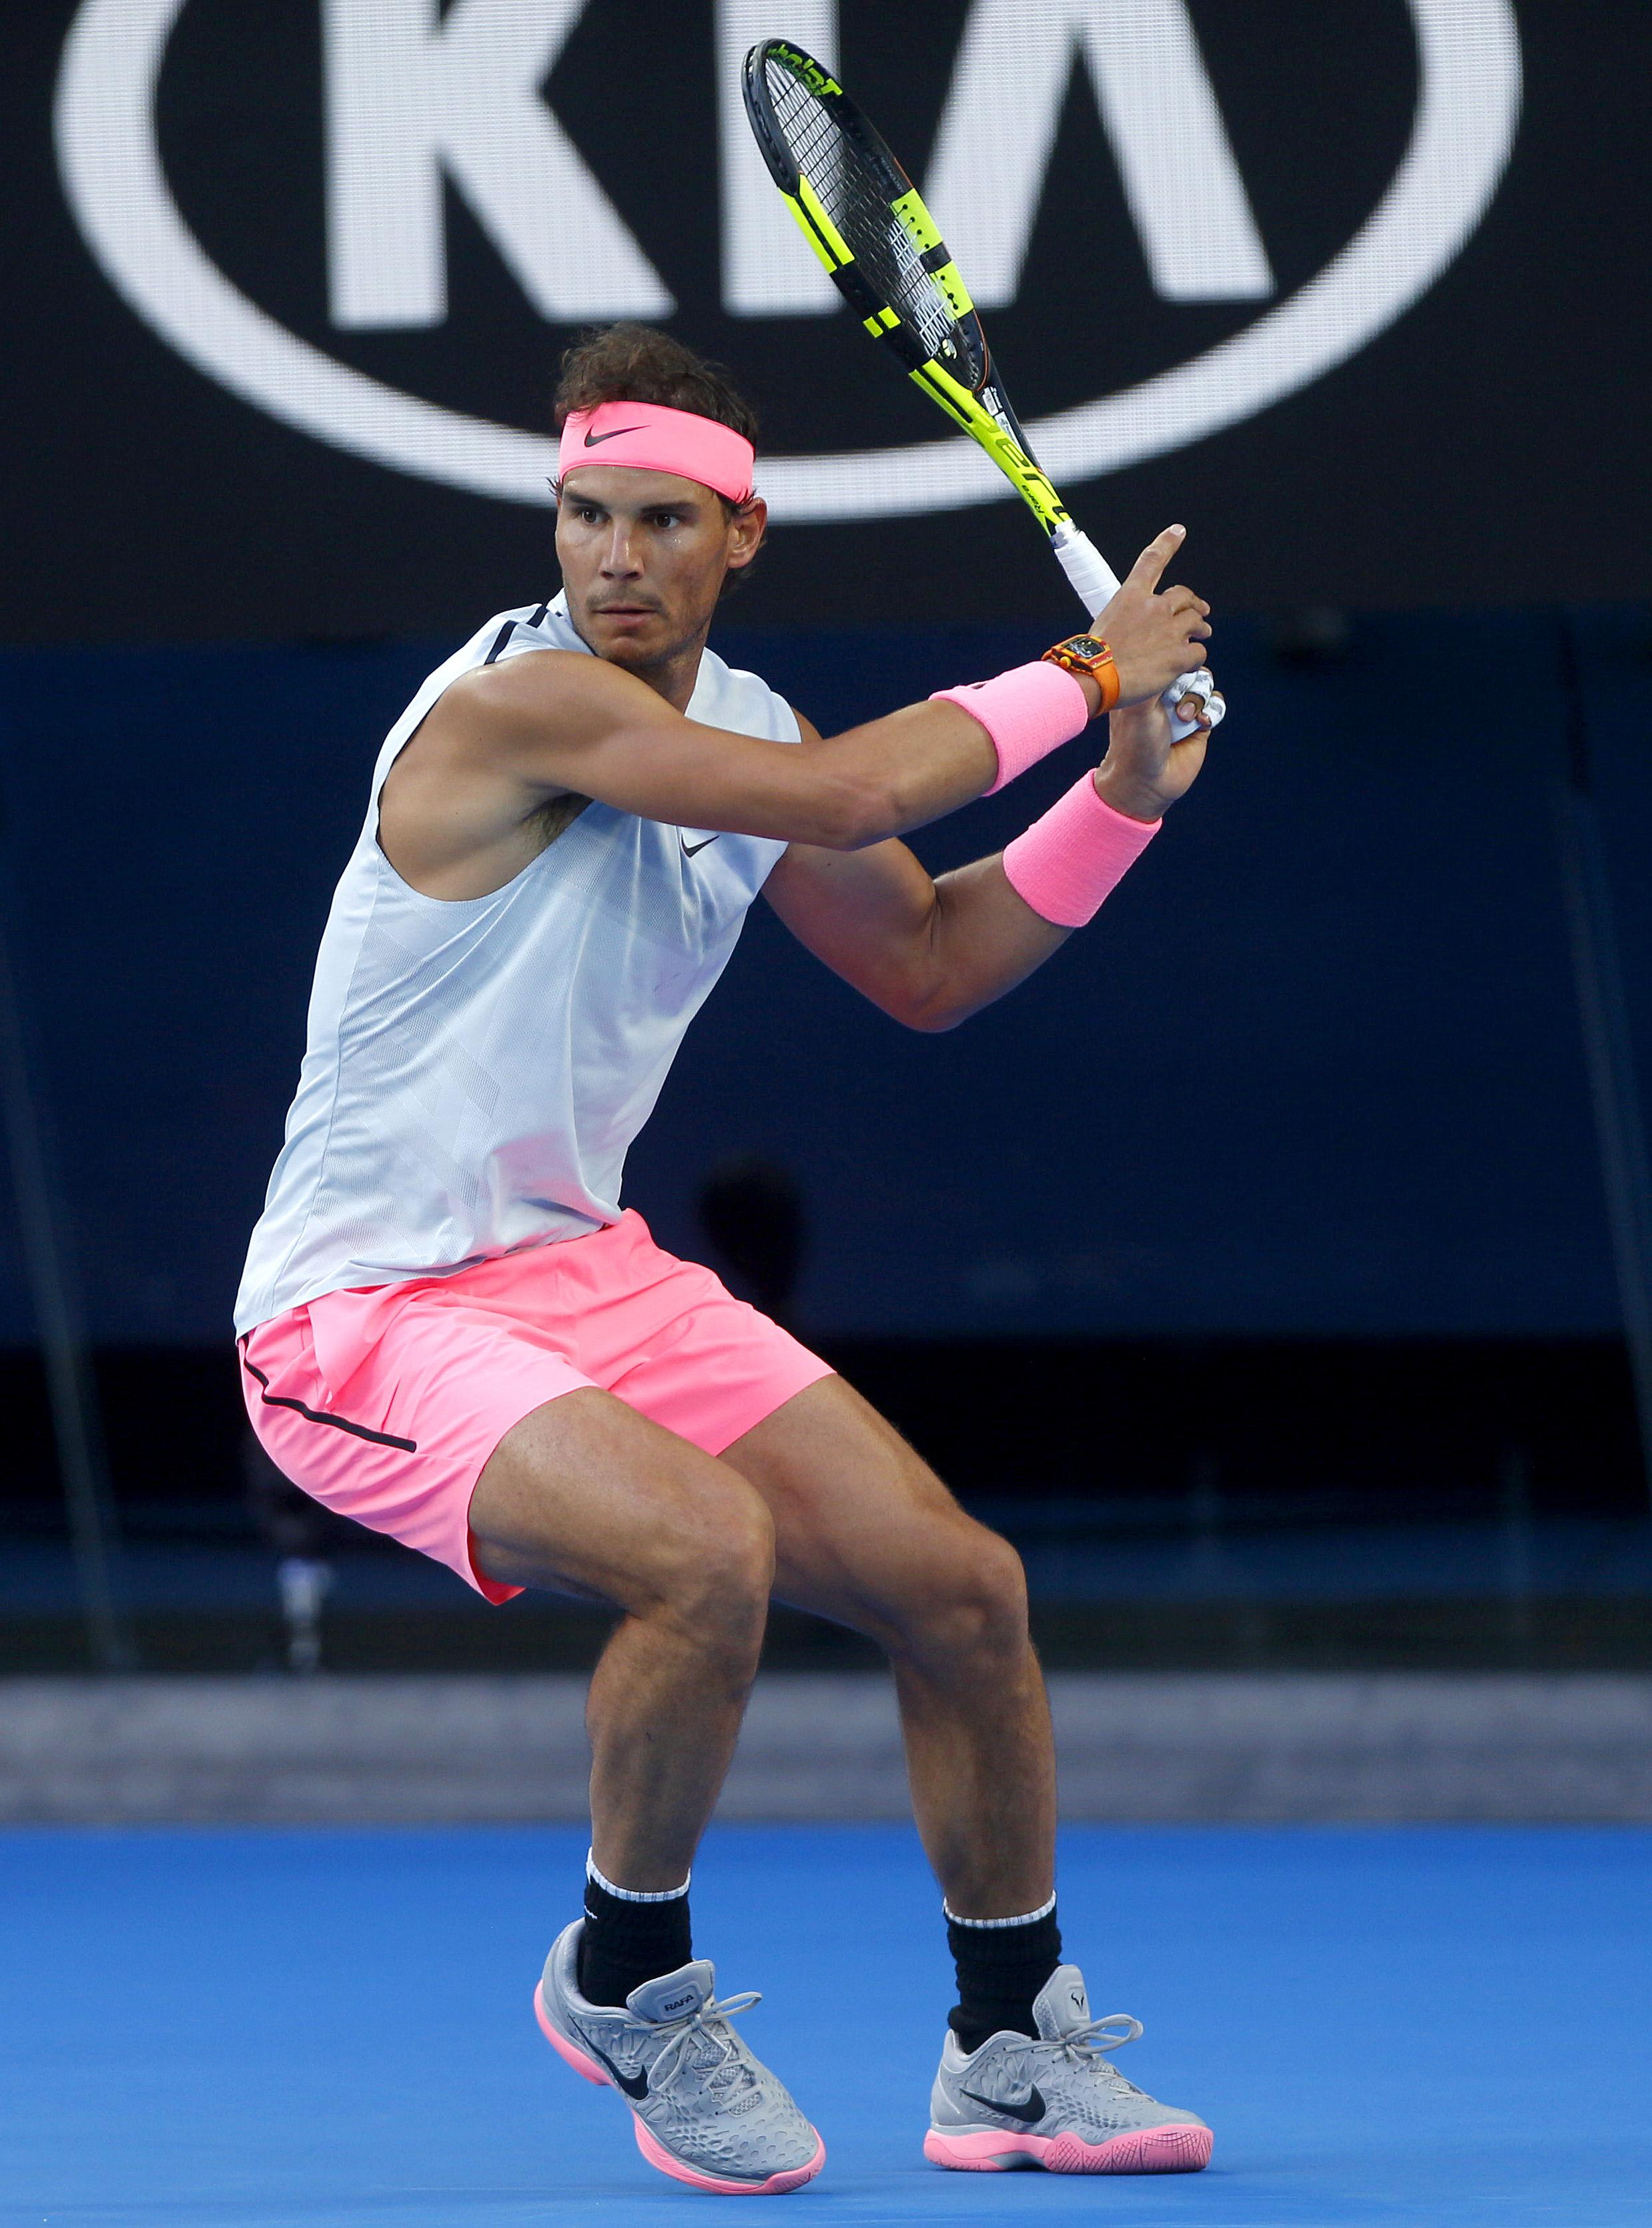 Rafael Nadal of Spain in actionAustralian Open, Melbourne Park, Melbourne, Australia - 15 Jan 2018